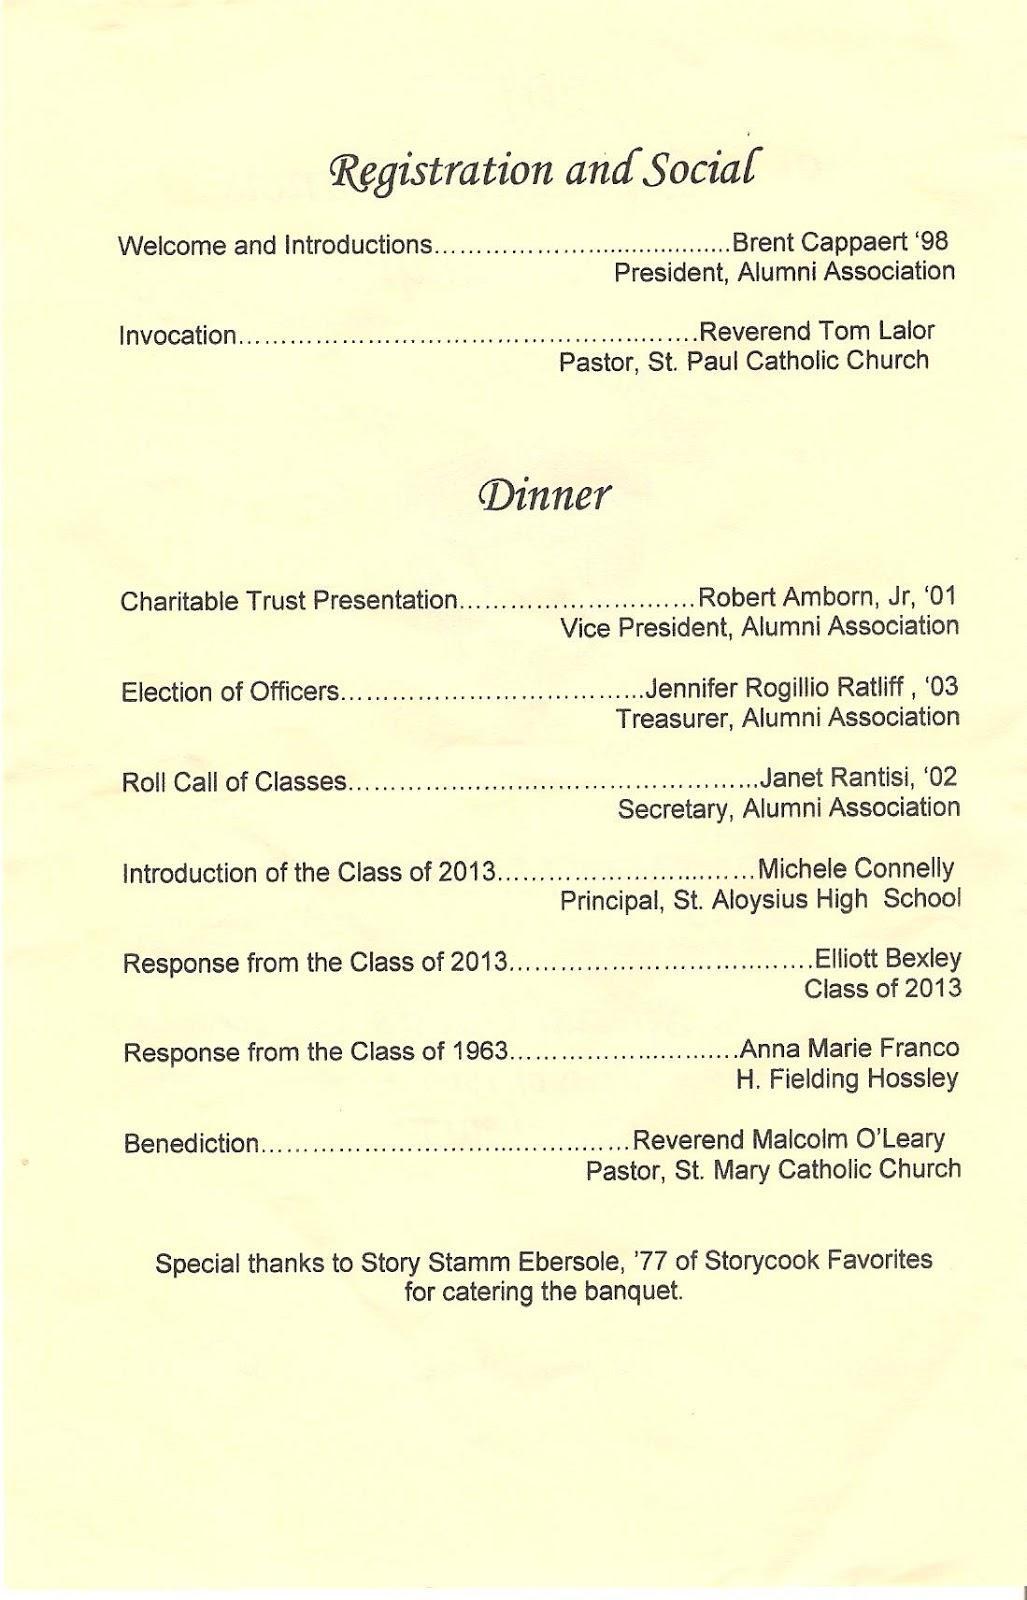 Family Reunion Banquet Program Template